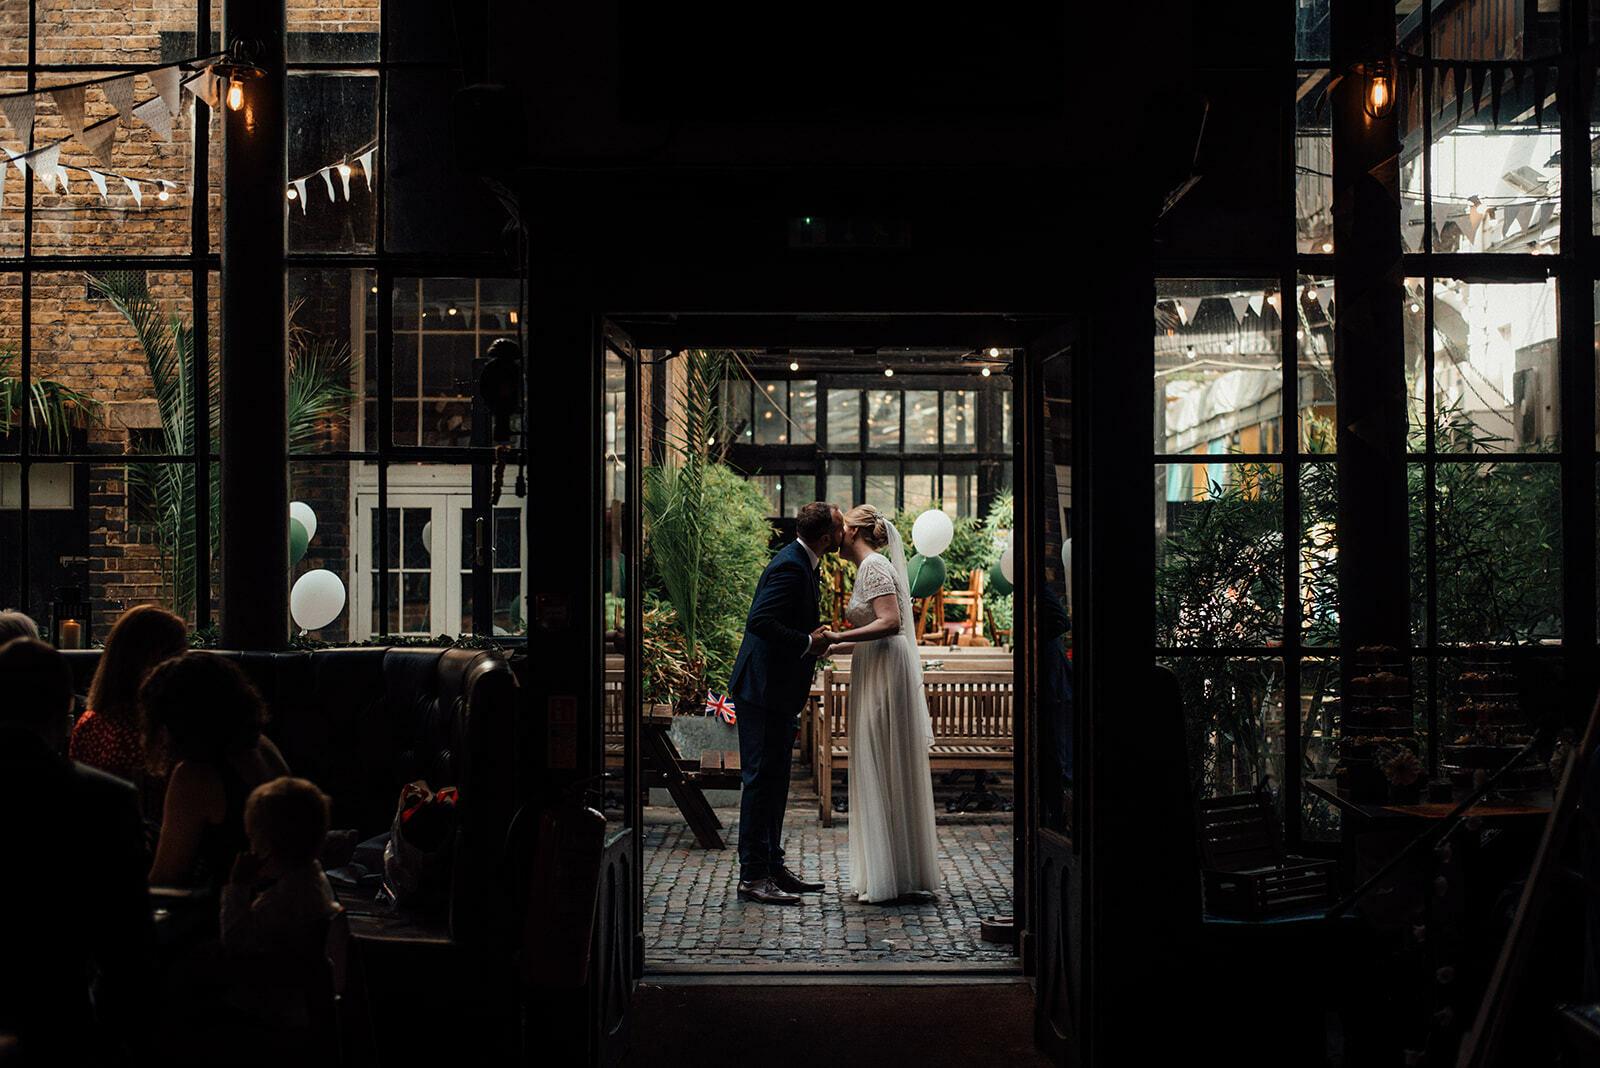 Bride and Groom kiss in the doorway of The Depot N7